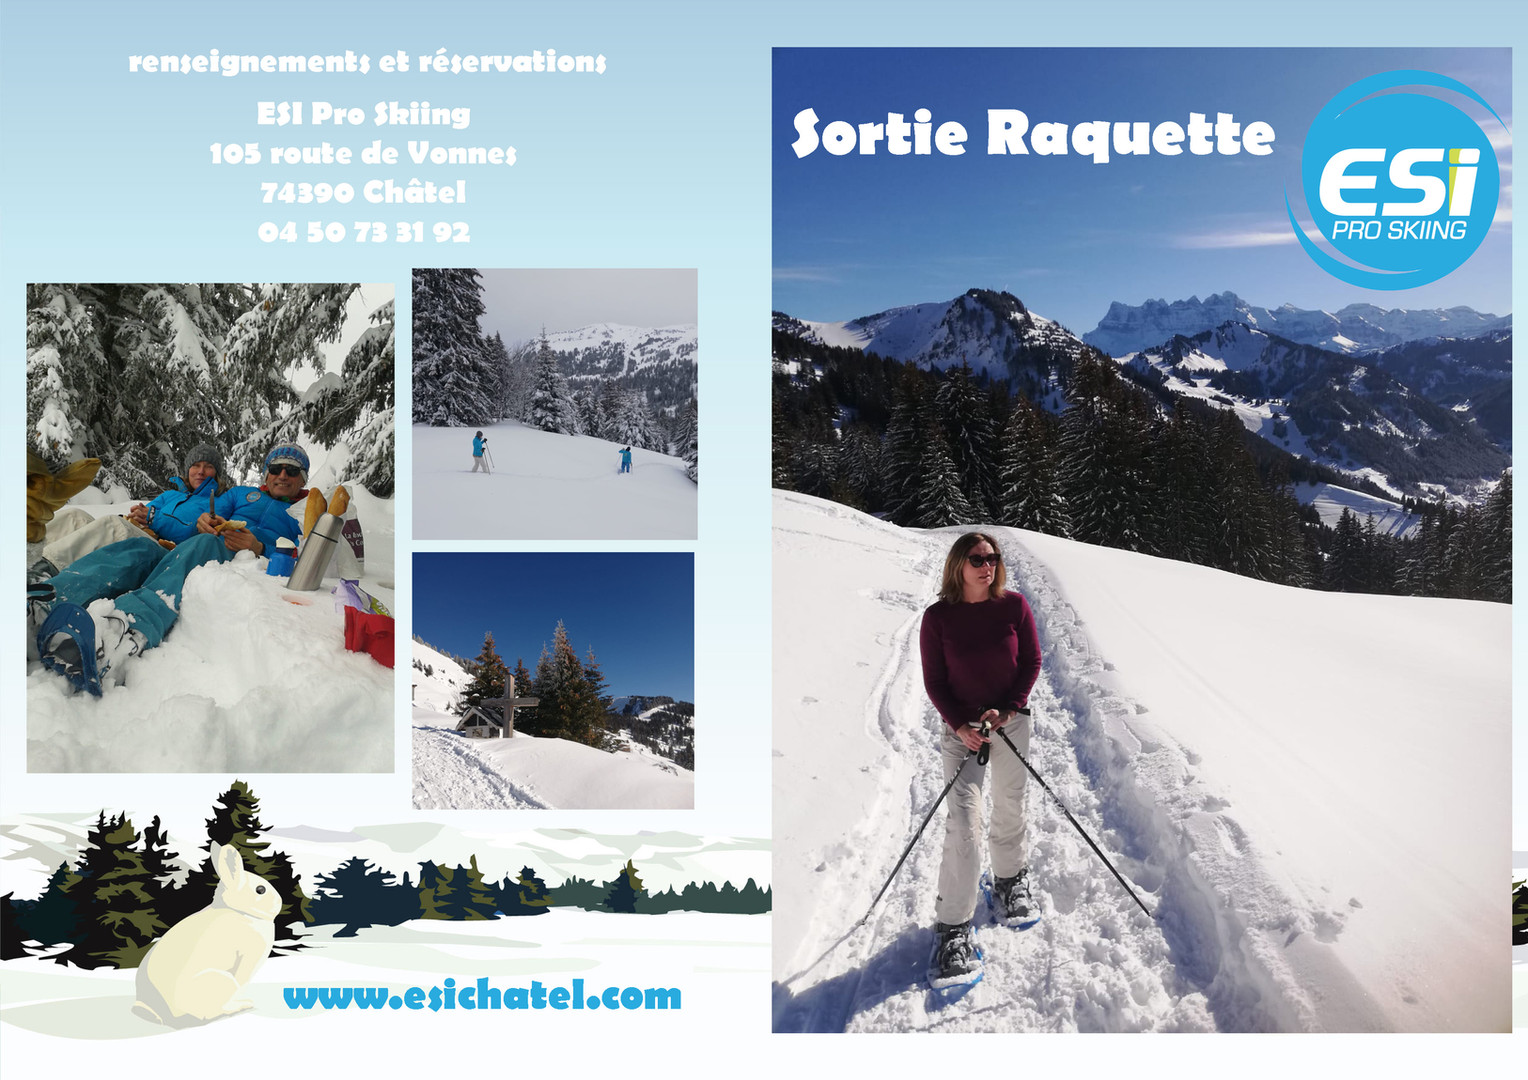 Sortie Raquette1